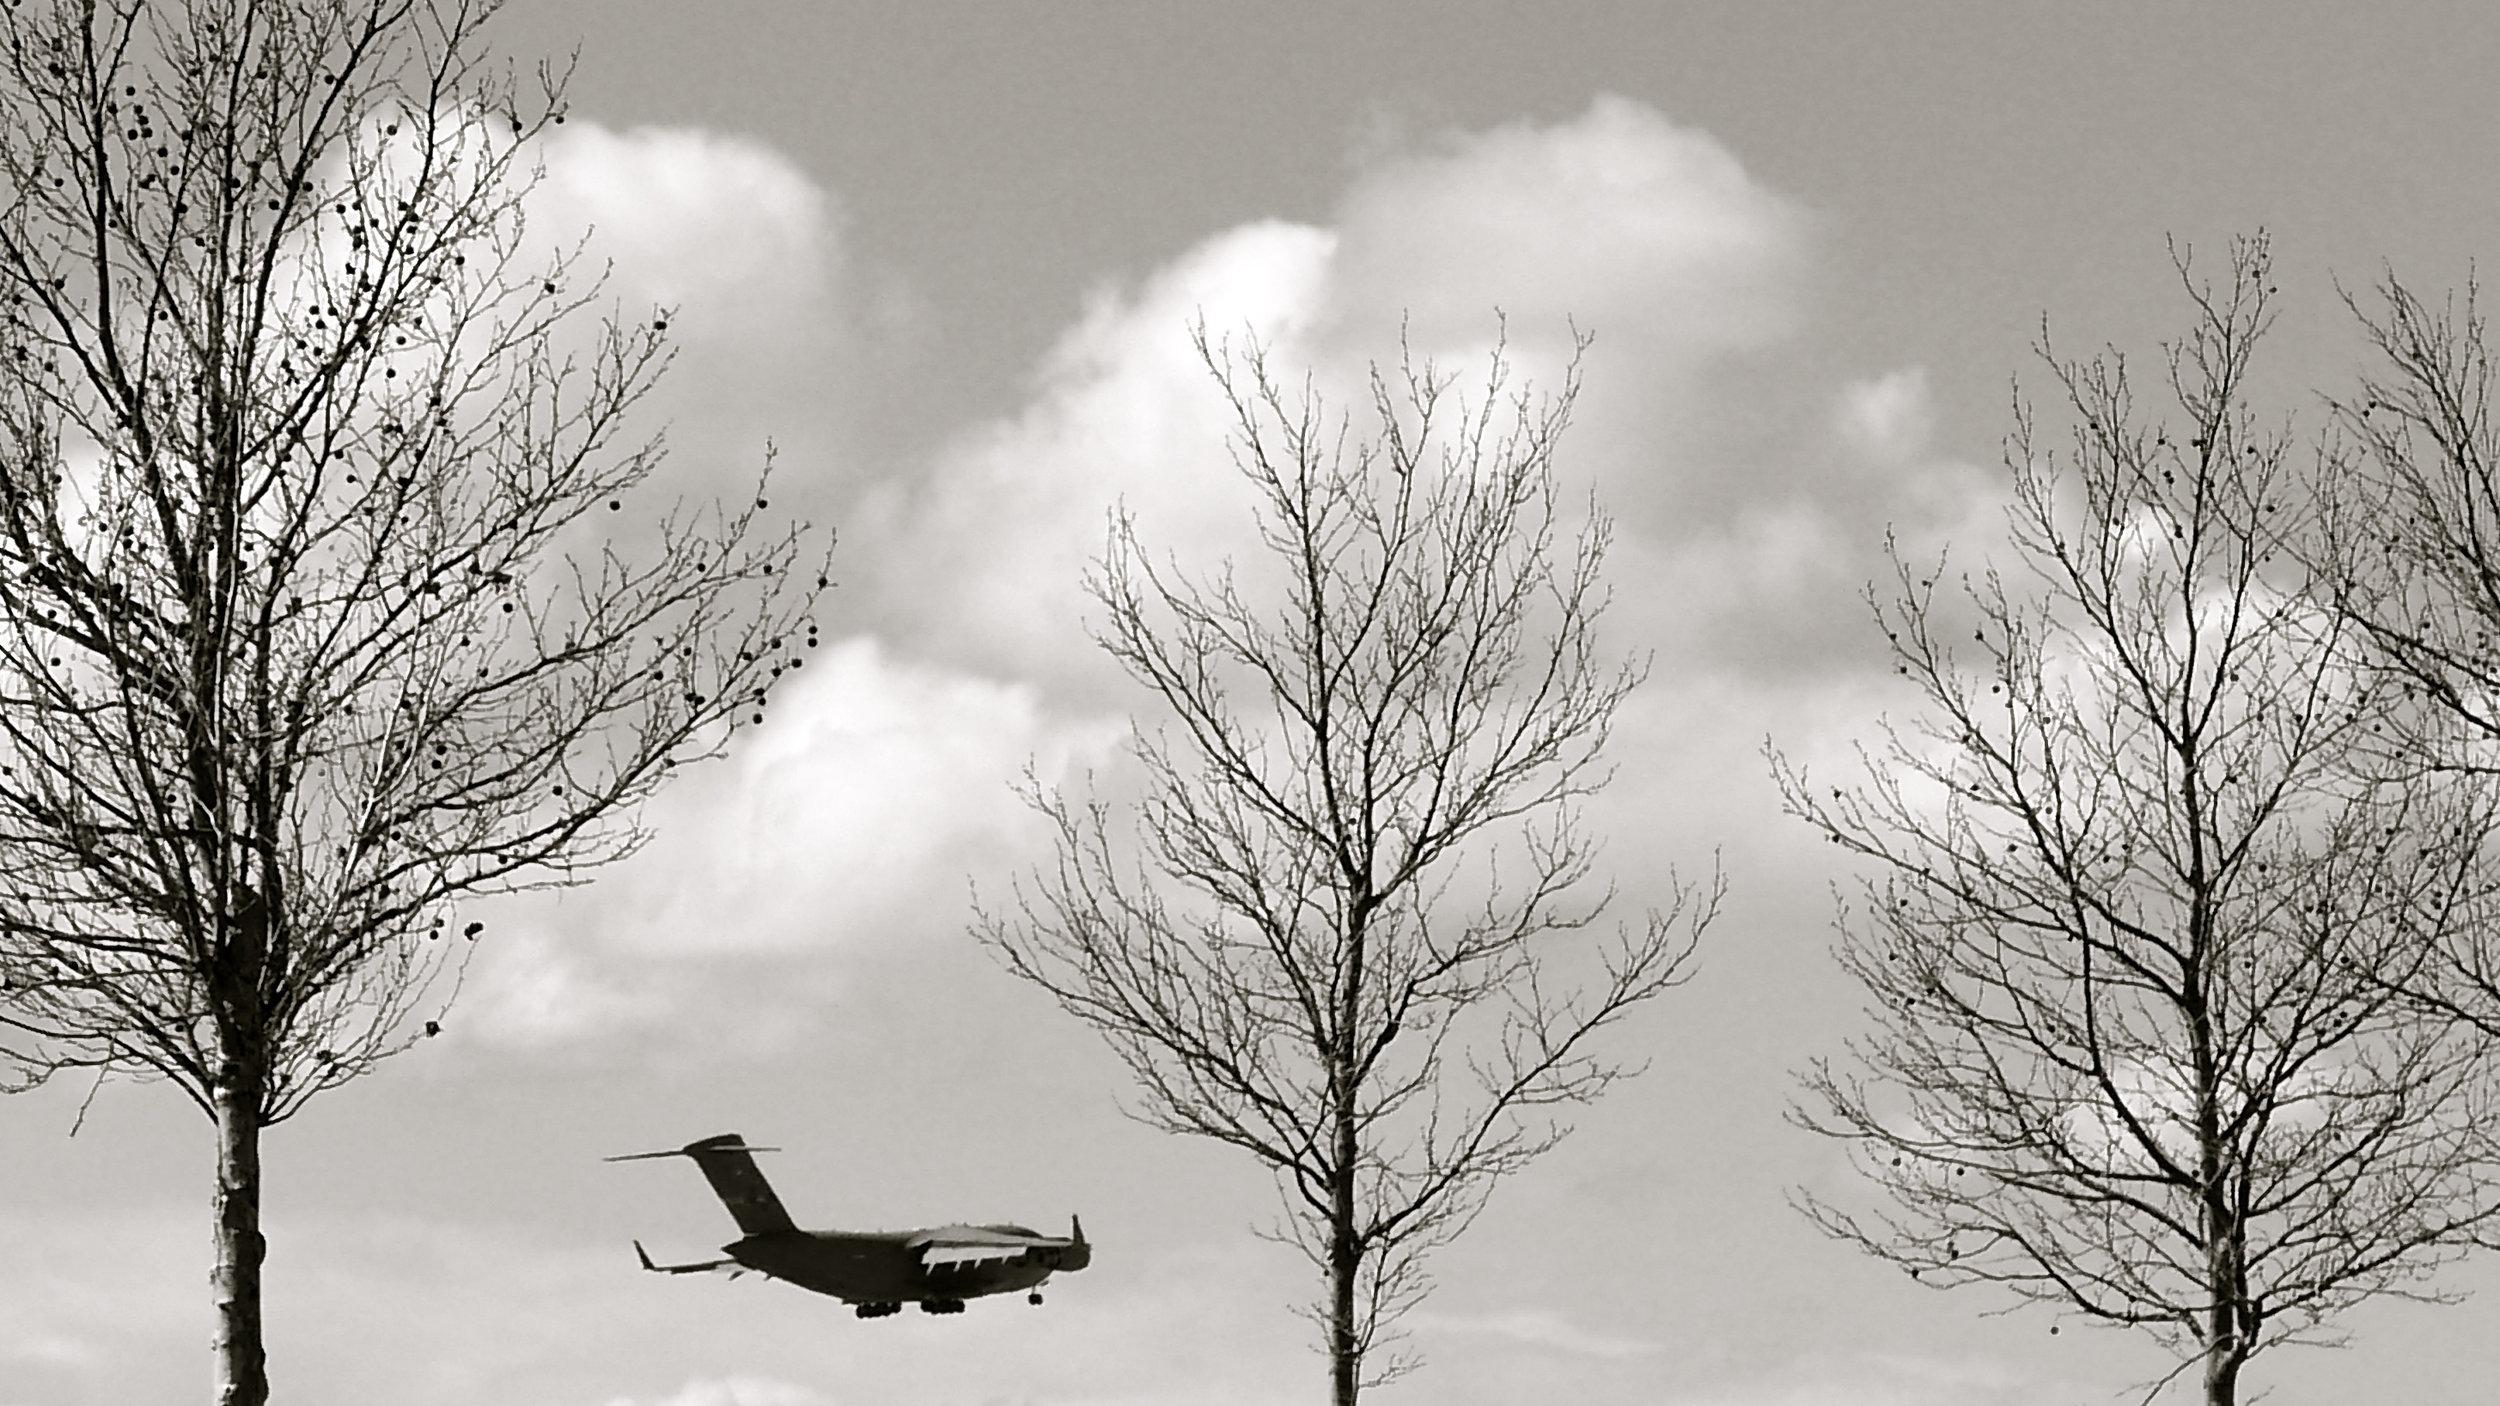 Avión aterrizaje